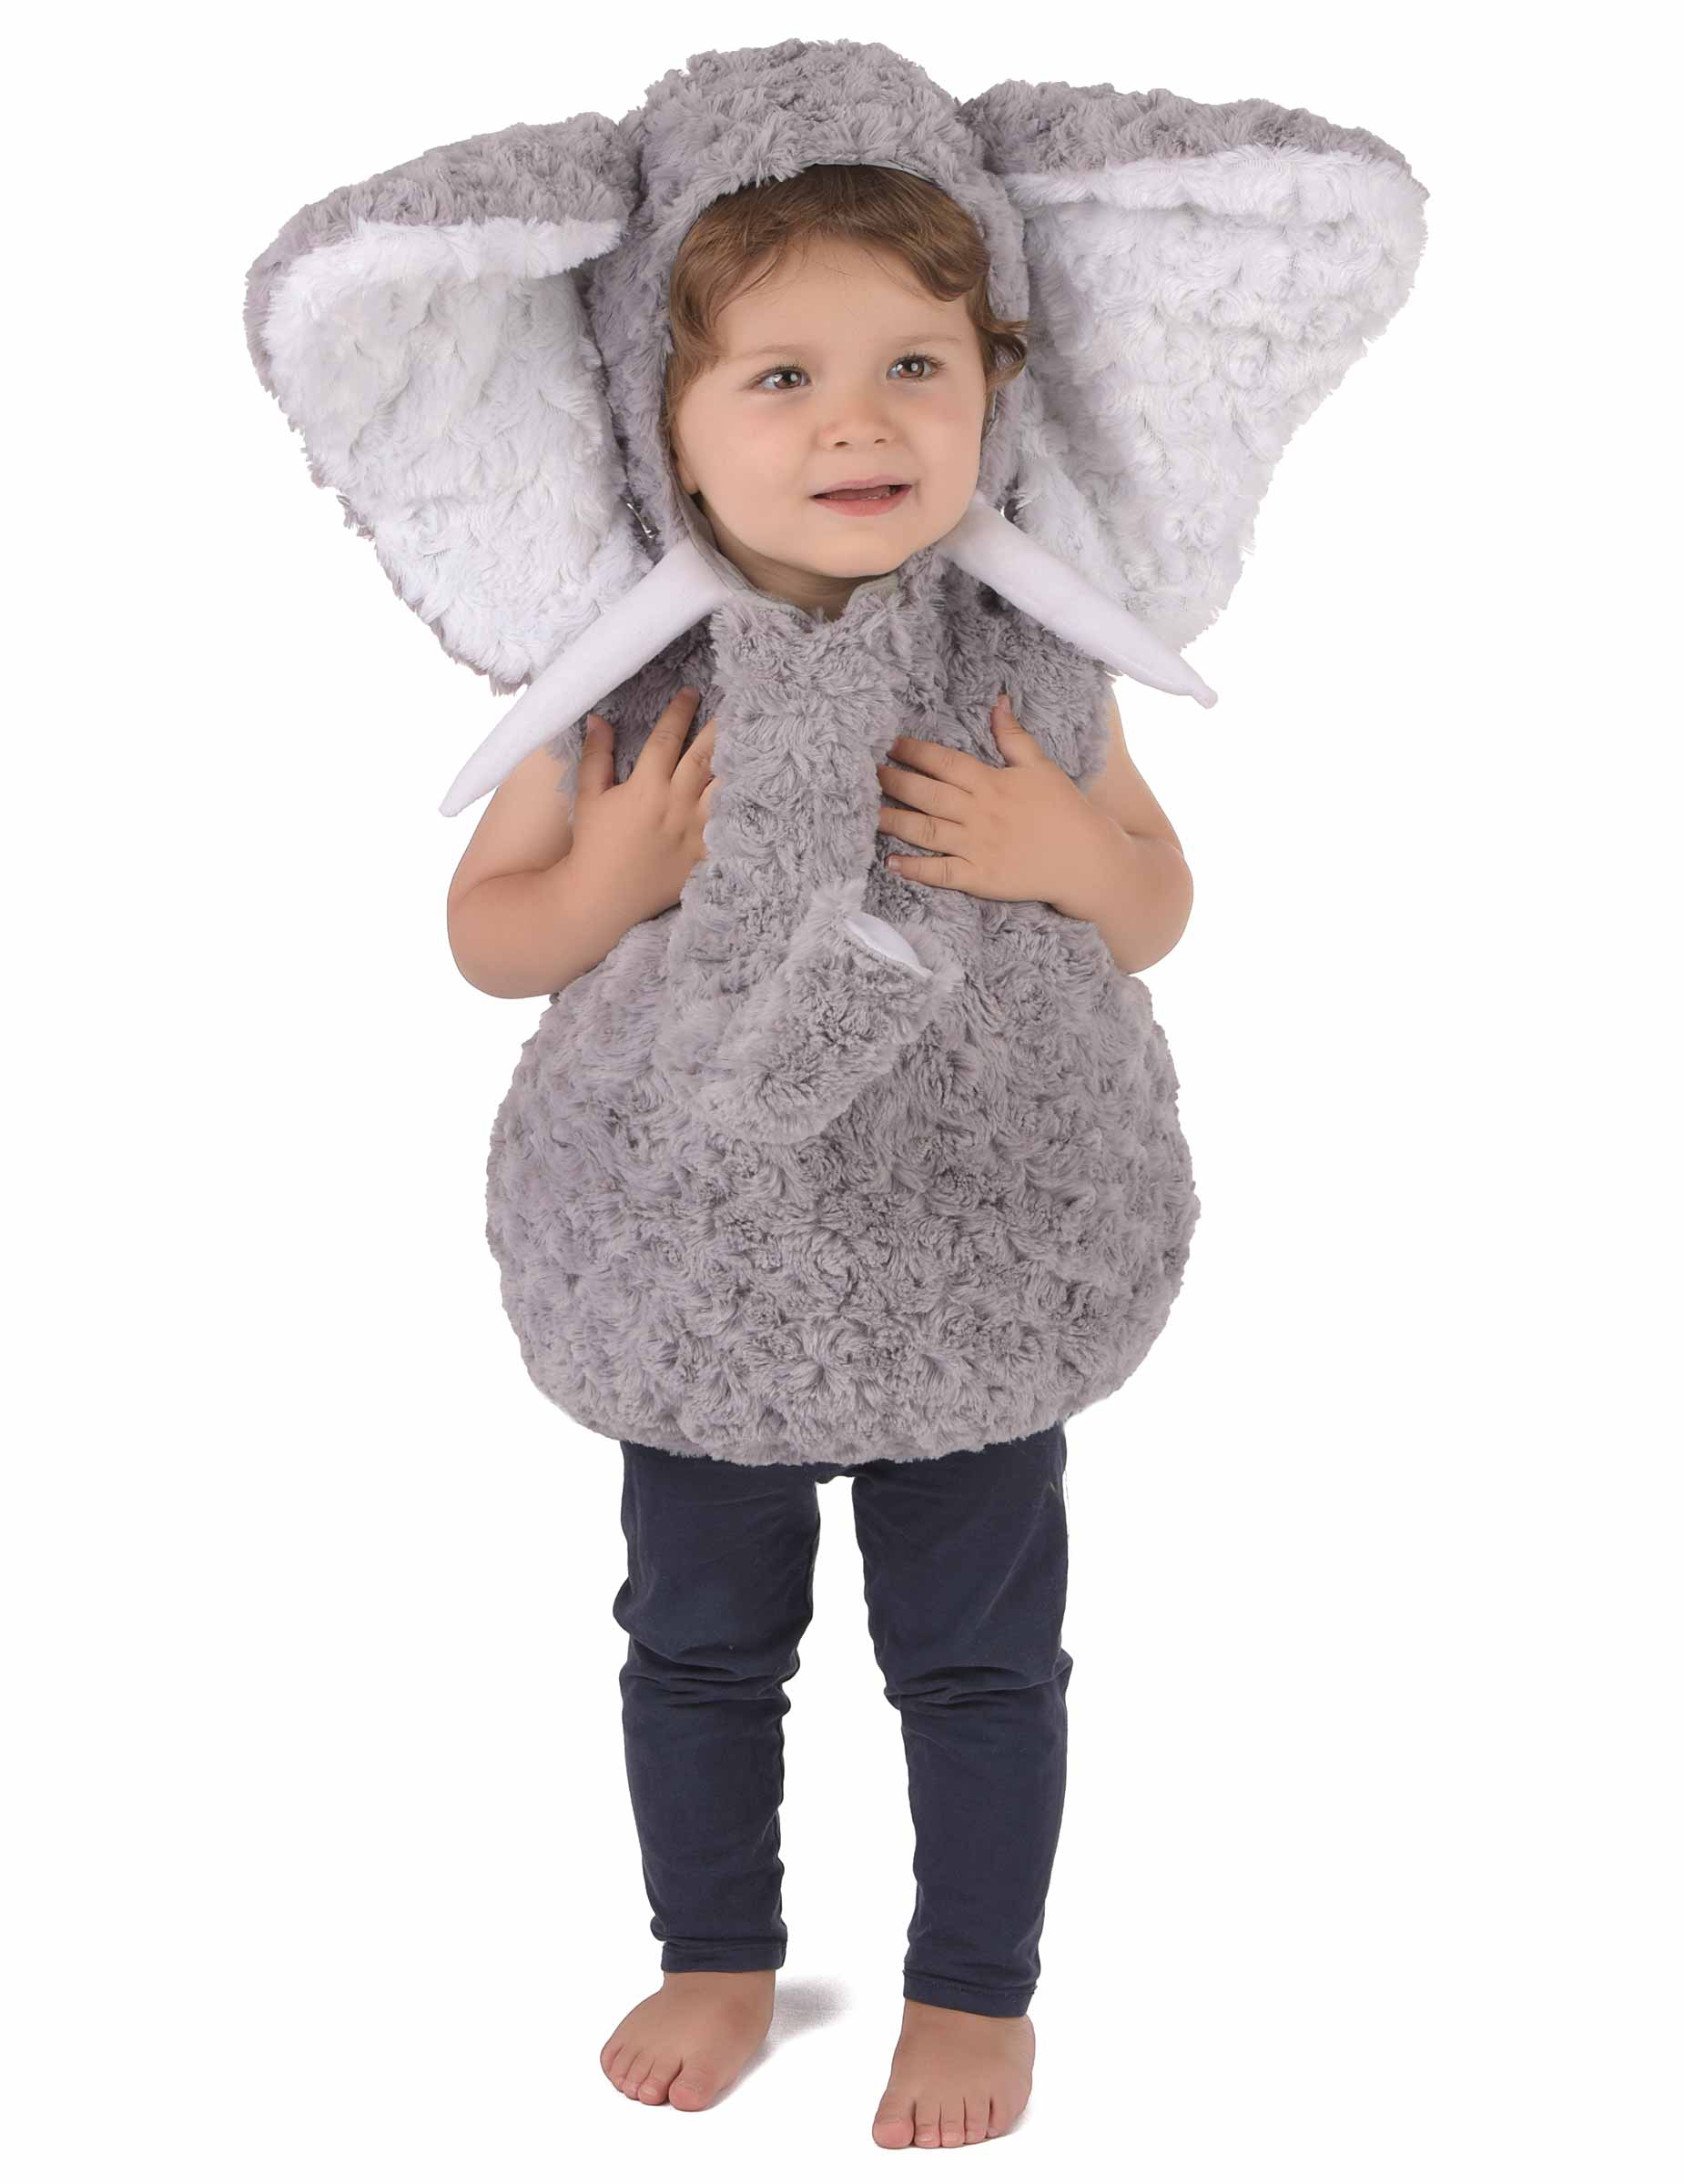 4c1566e8fb5 Elefant plyskostume til børn